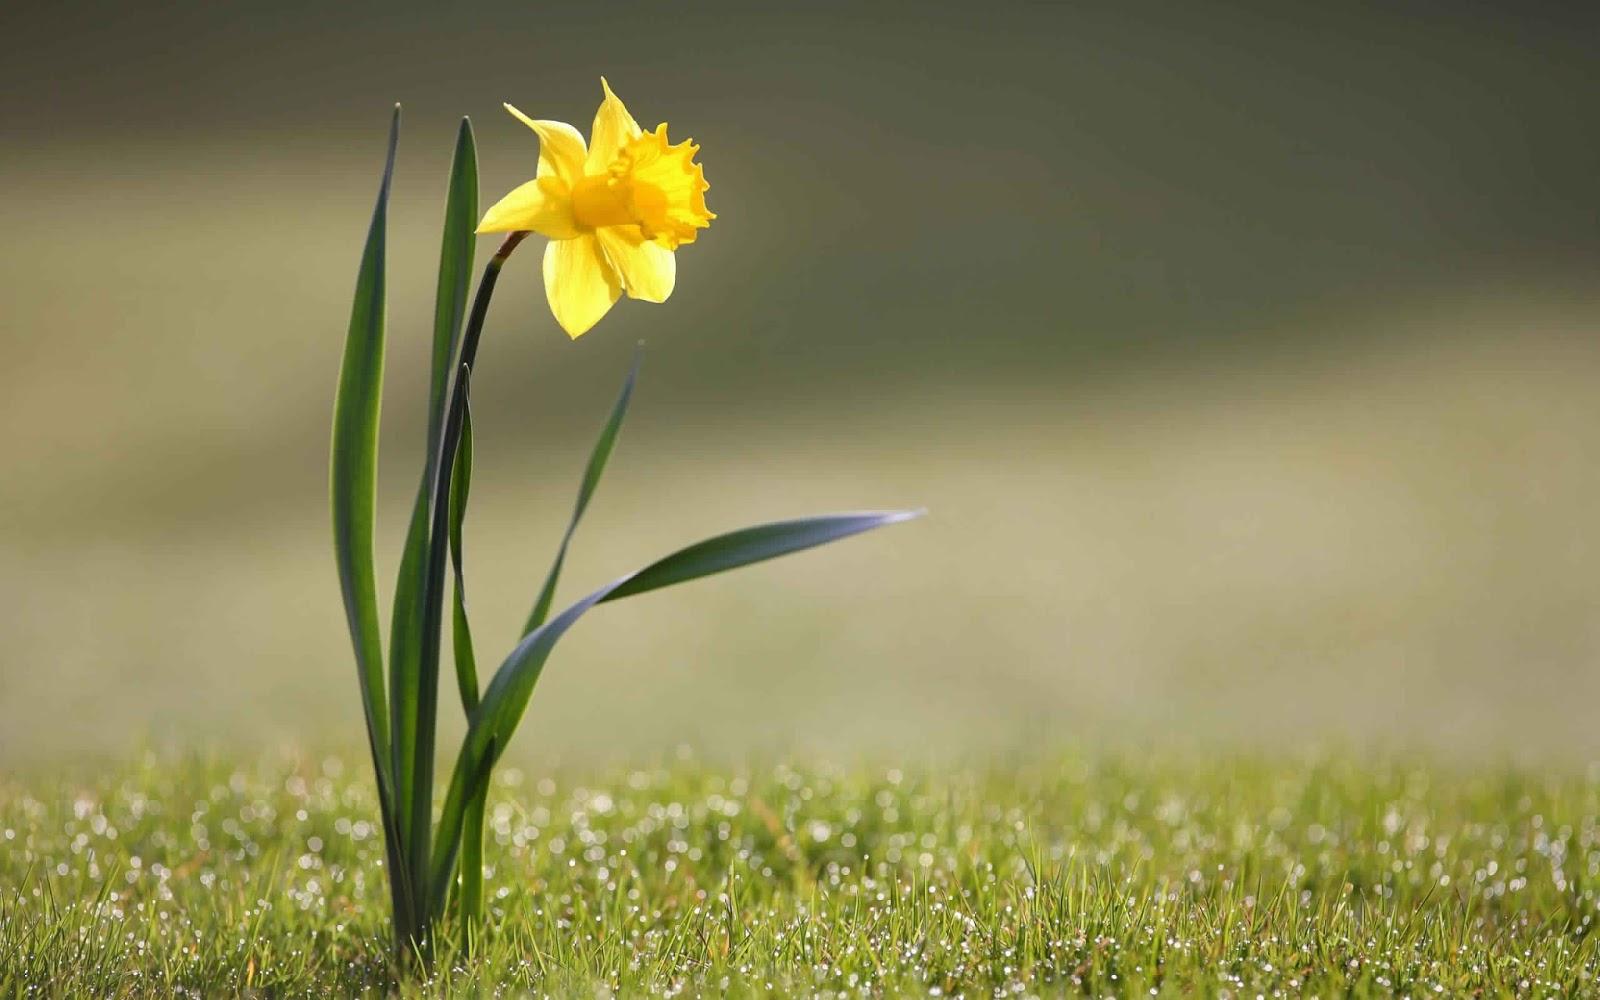 صور صور زهور , صور ازهار جميلة